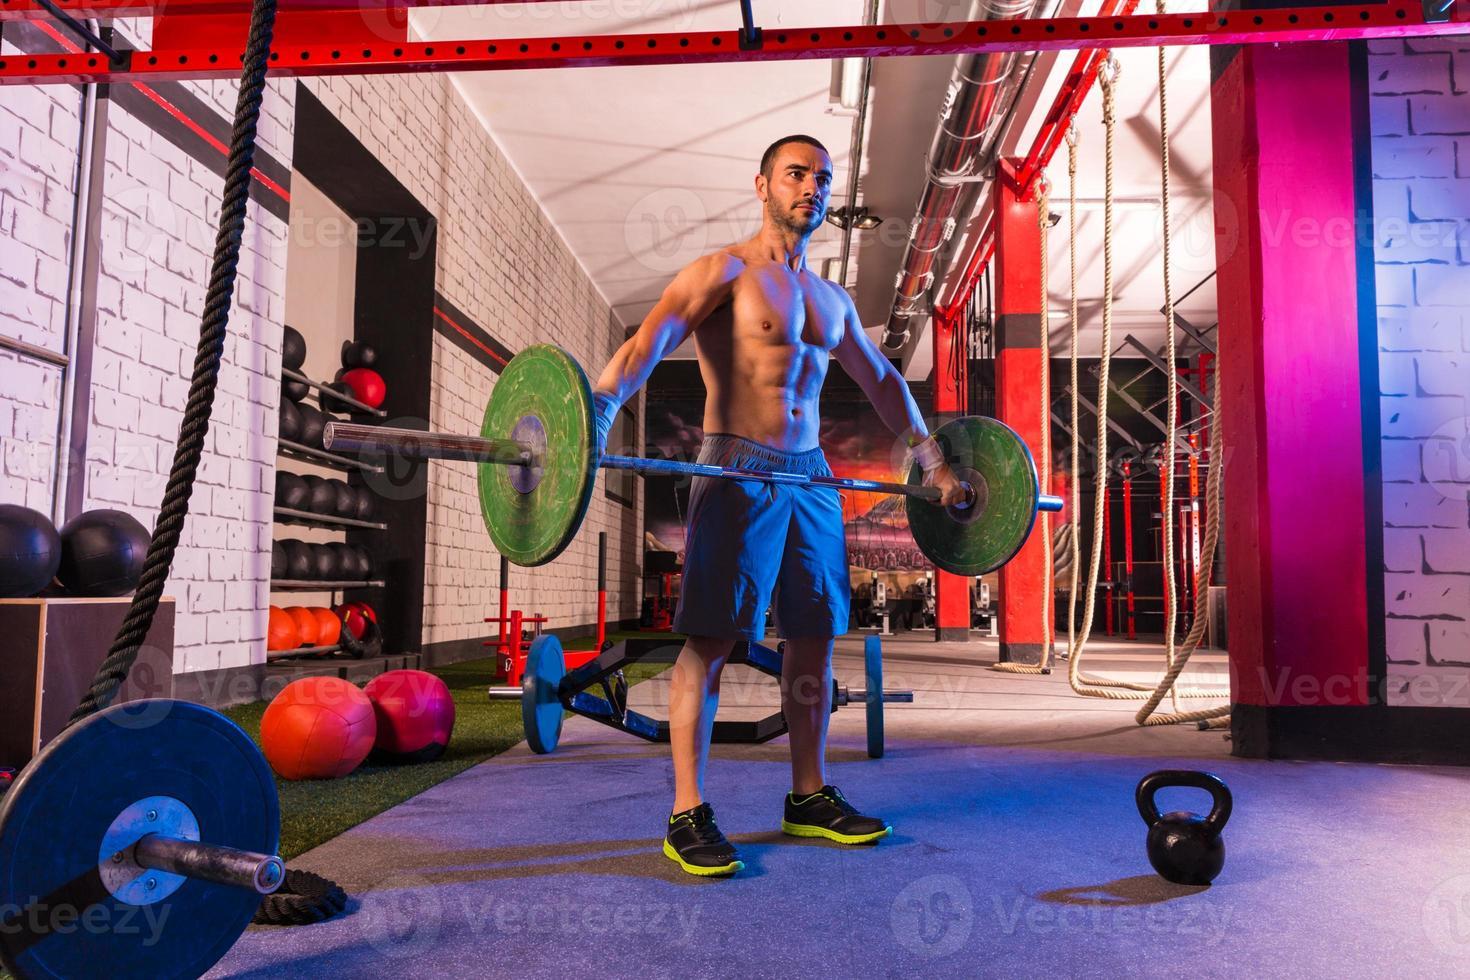 sollevamento pesi bilanciere uomo allenamento esercizio palestra foto